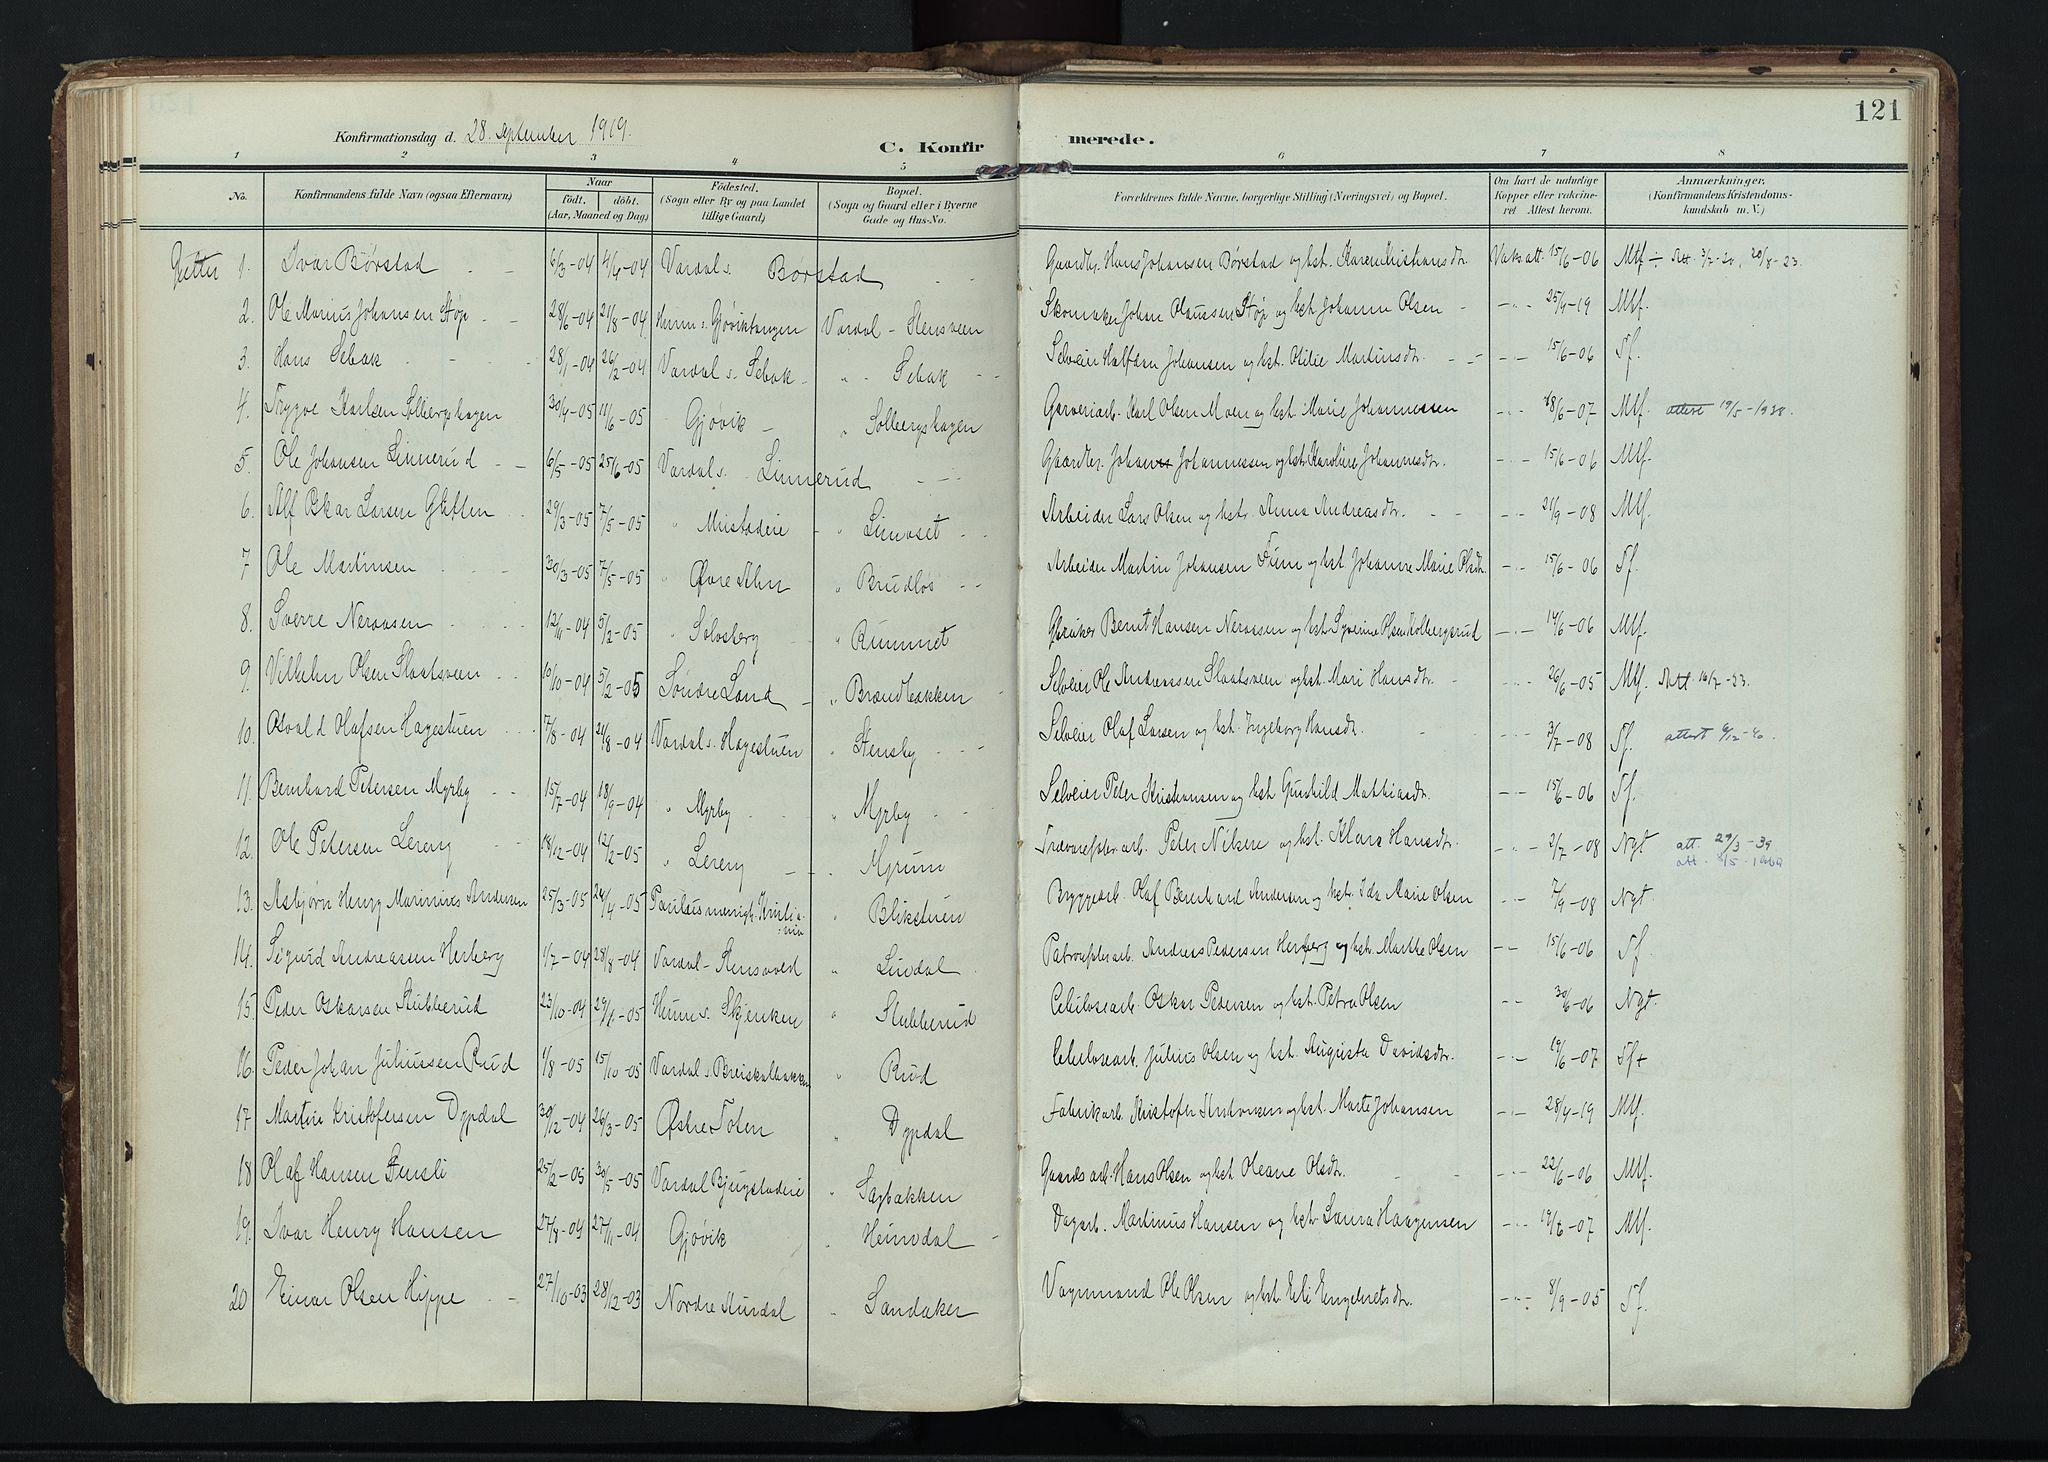 SAH, Vardal prestekontor, H/Ha/Haa/L0020: Ministerialbok nr. 20, 1907-1921, s. 121